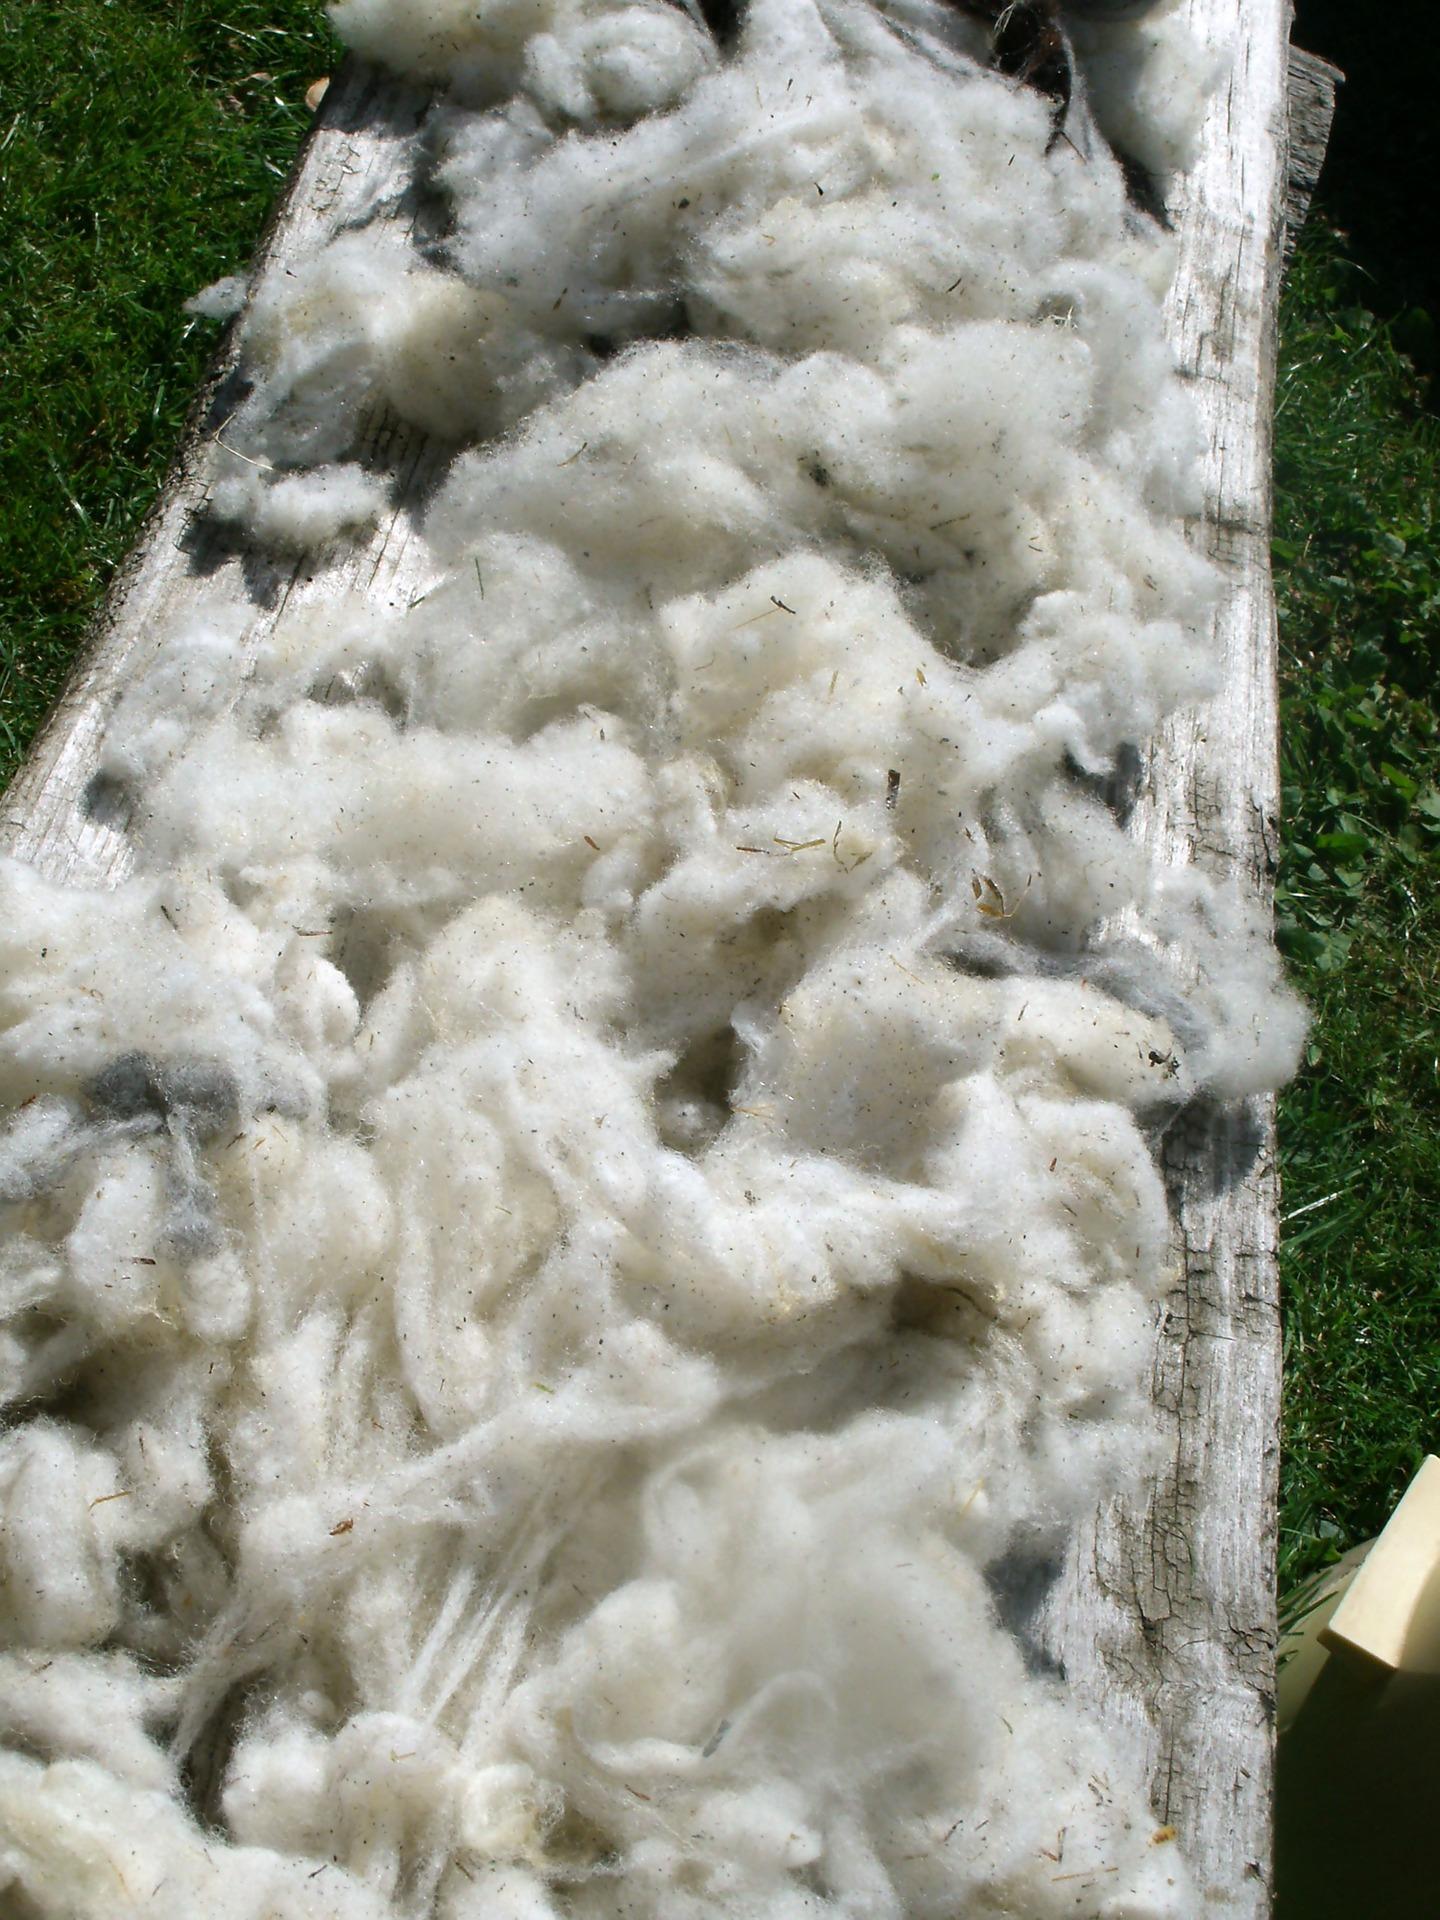 raw-wool-699950-1920.jpg